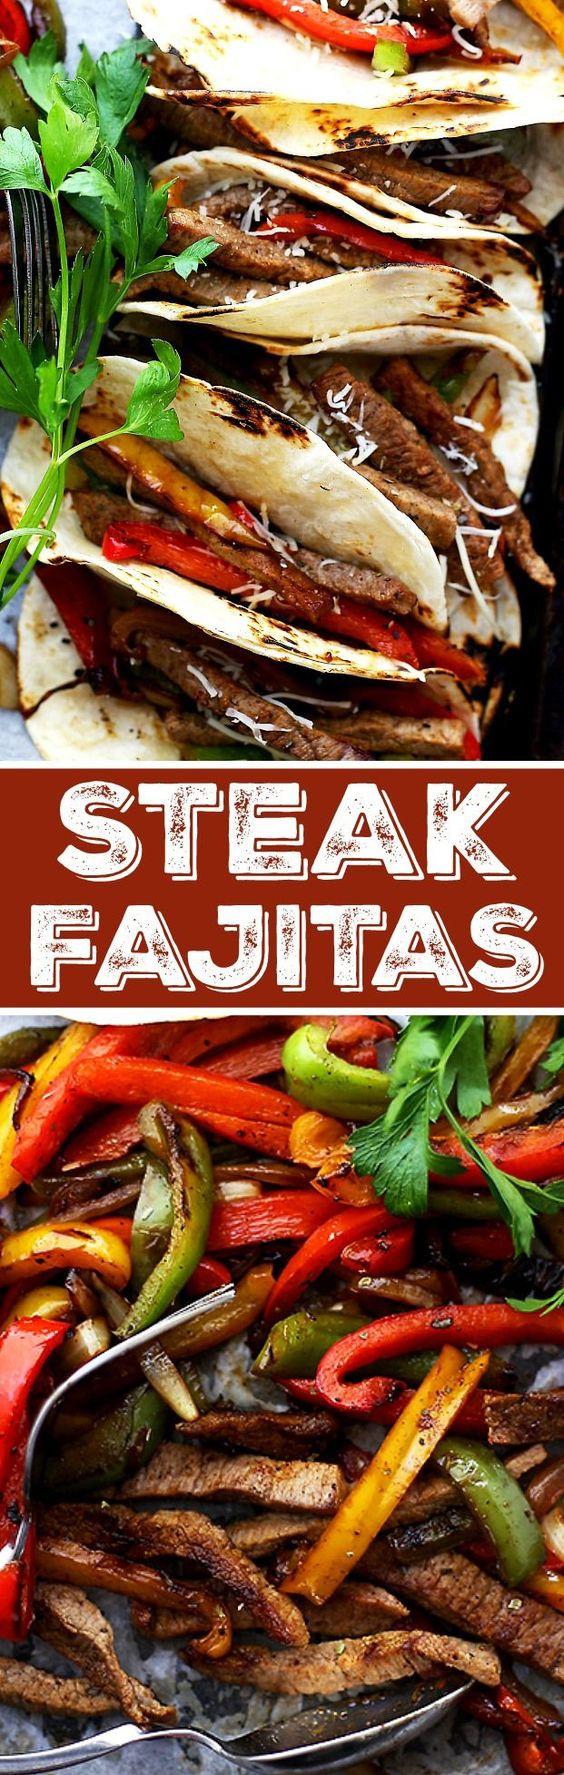 Steak Fajitas | www.diethood.com | Perfectly seasoned, classic steak fajitas with onions and peppers, wrapped in warm flour tortillas.